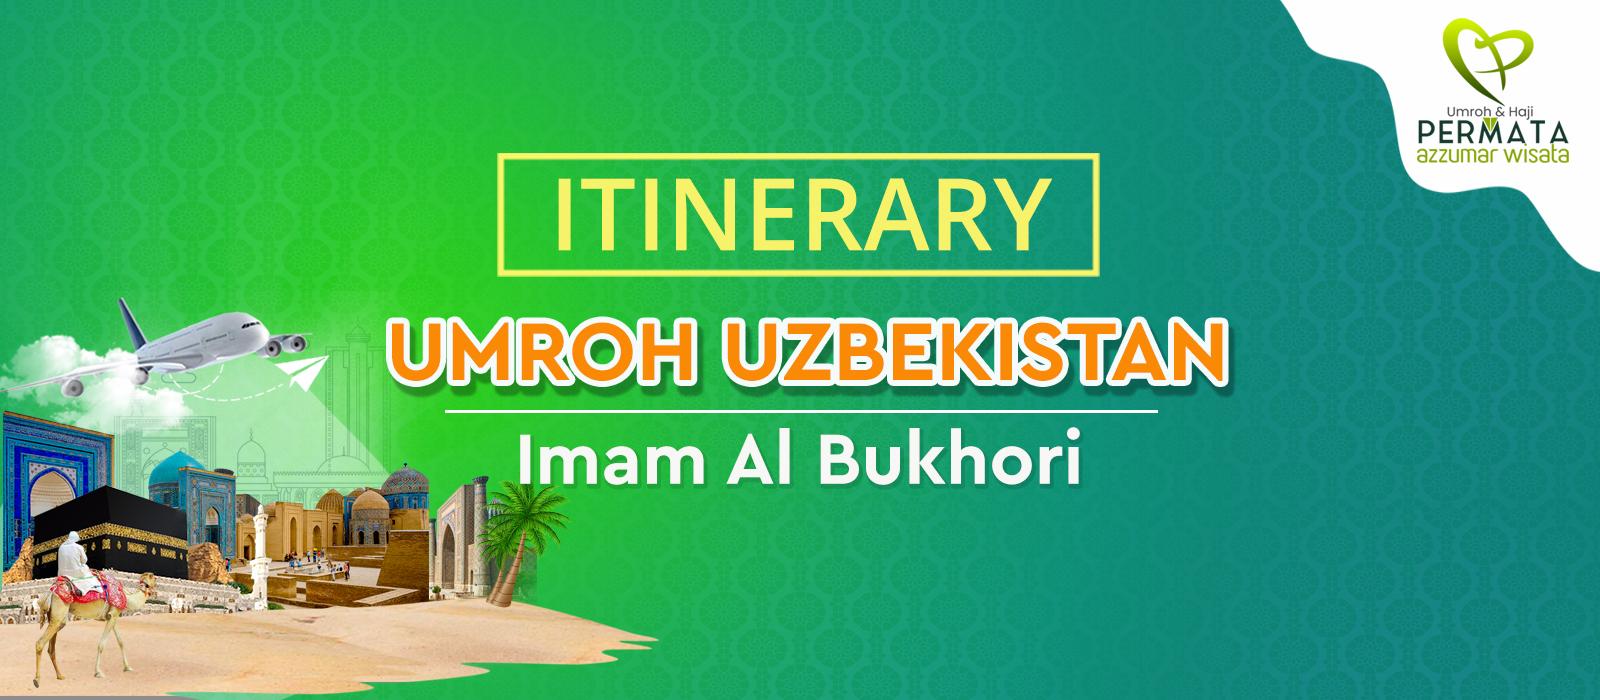 program Umroh plus uzbekistan 12 hari